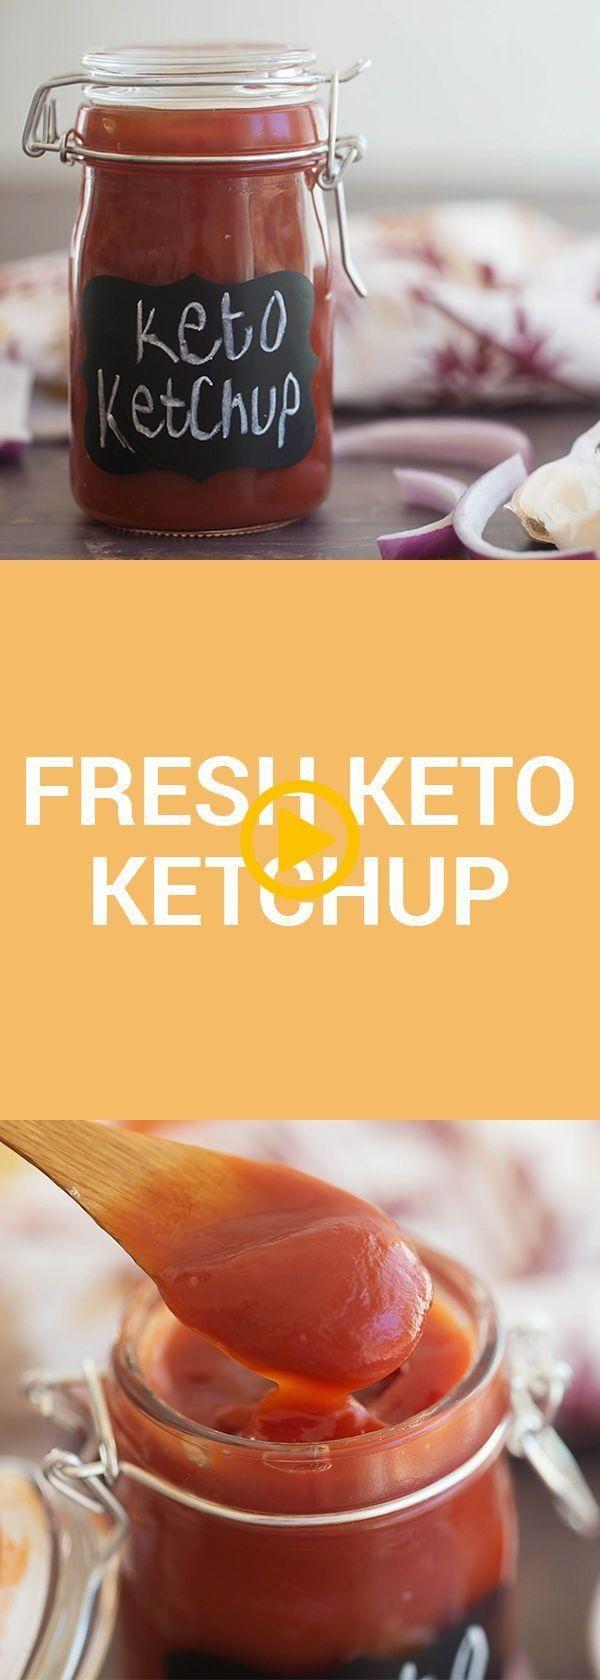 Fitness et santé - #cheto-cavolo-ricette #cheto-LCHF-ricette #Fitness #ketocrockpotrecipes #ketodiet...